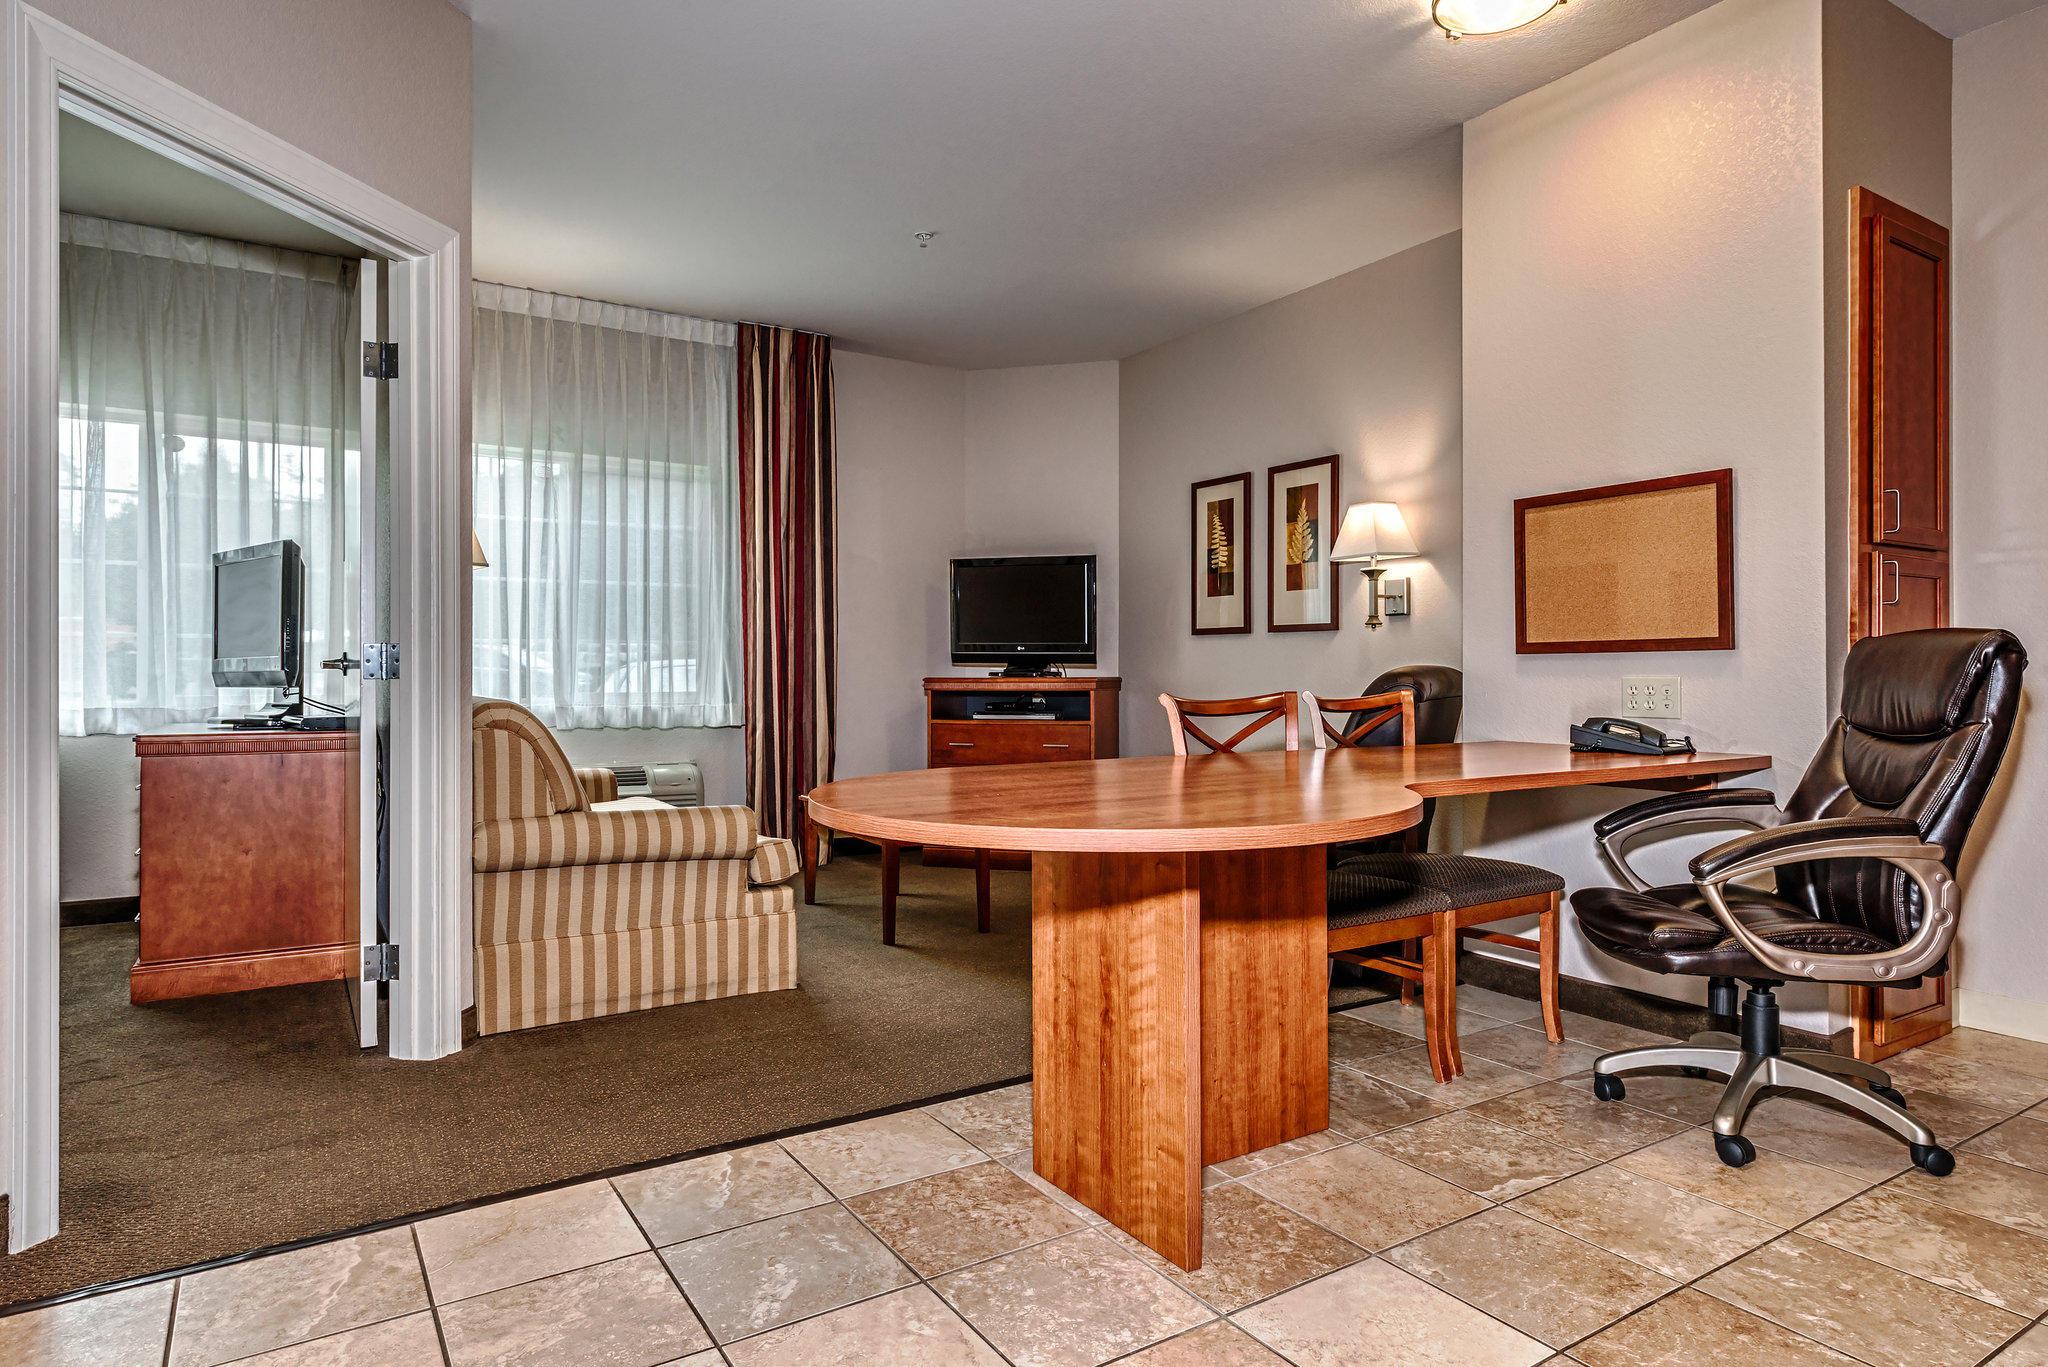 Candlewood Suites Oak Harbor in Oak Harbor, WA, photo #18